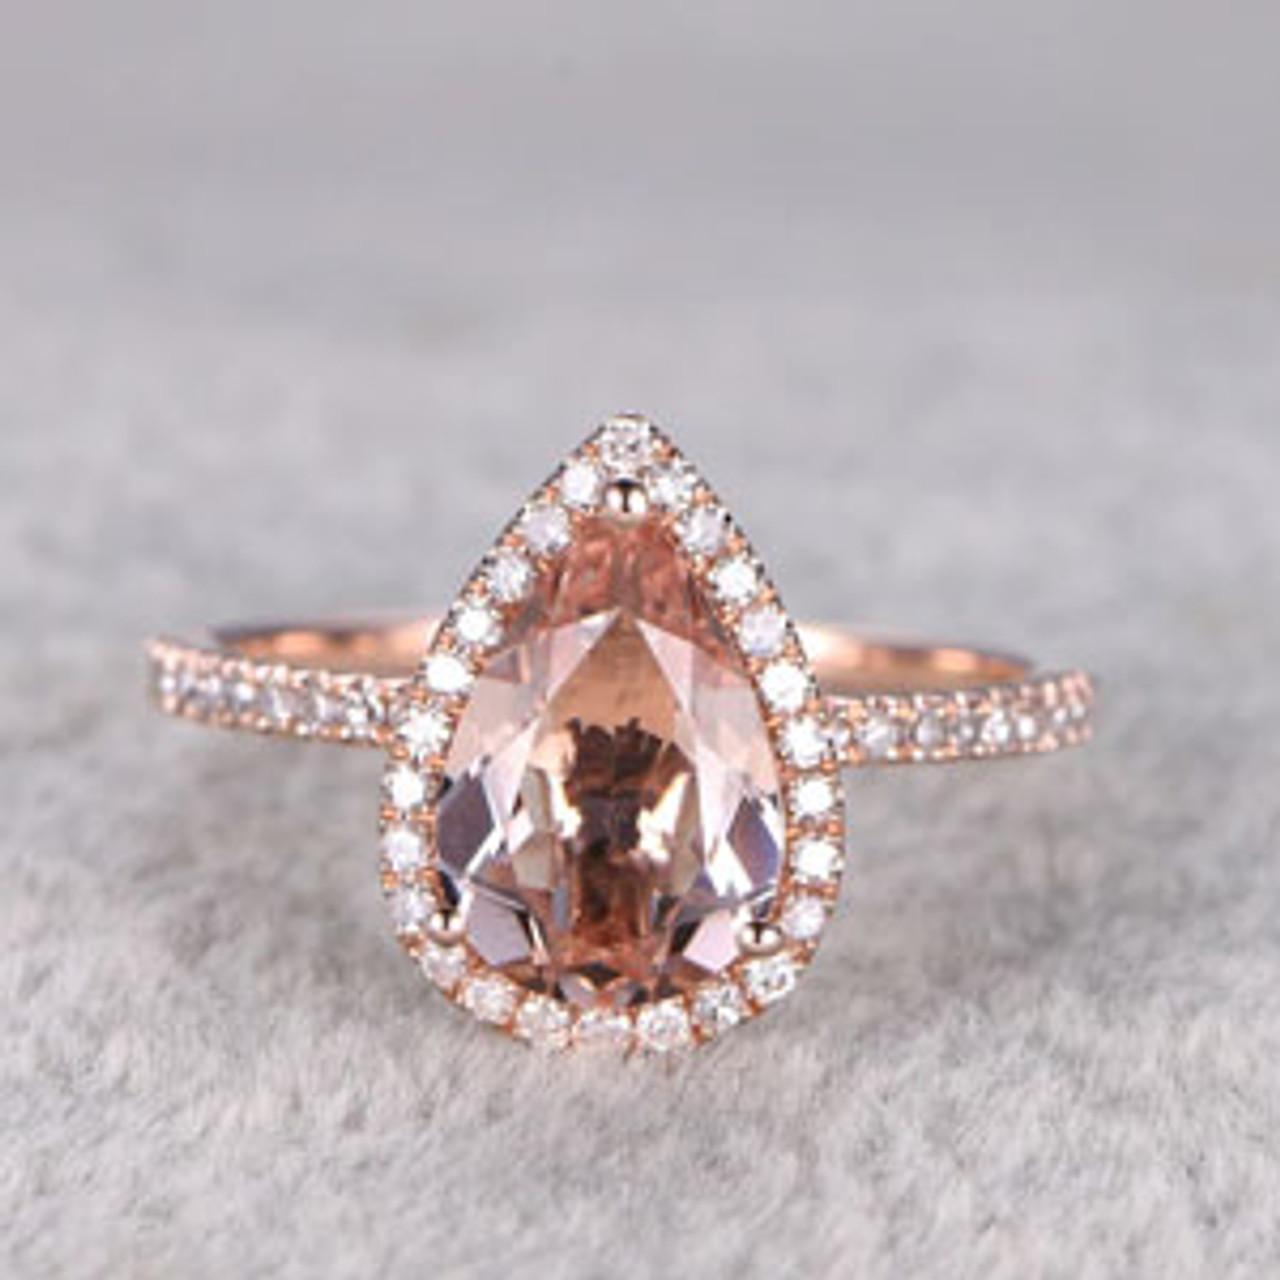 2 Carat Pear Shaped Morganite Engagement Ring Diamond